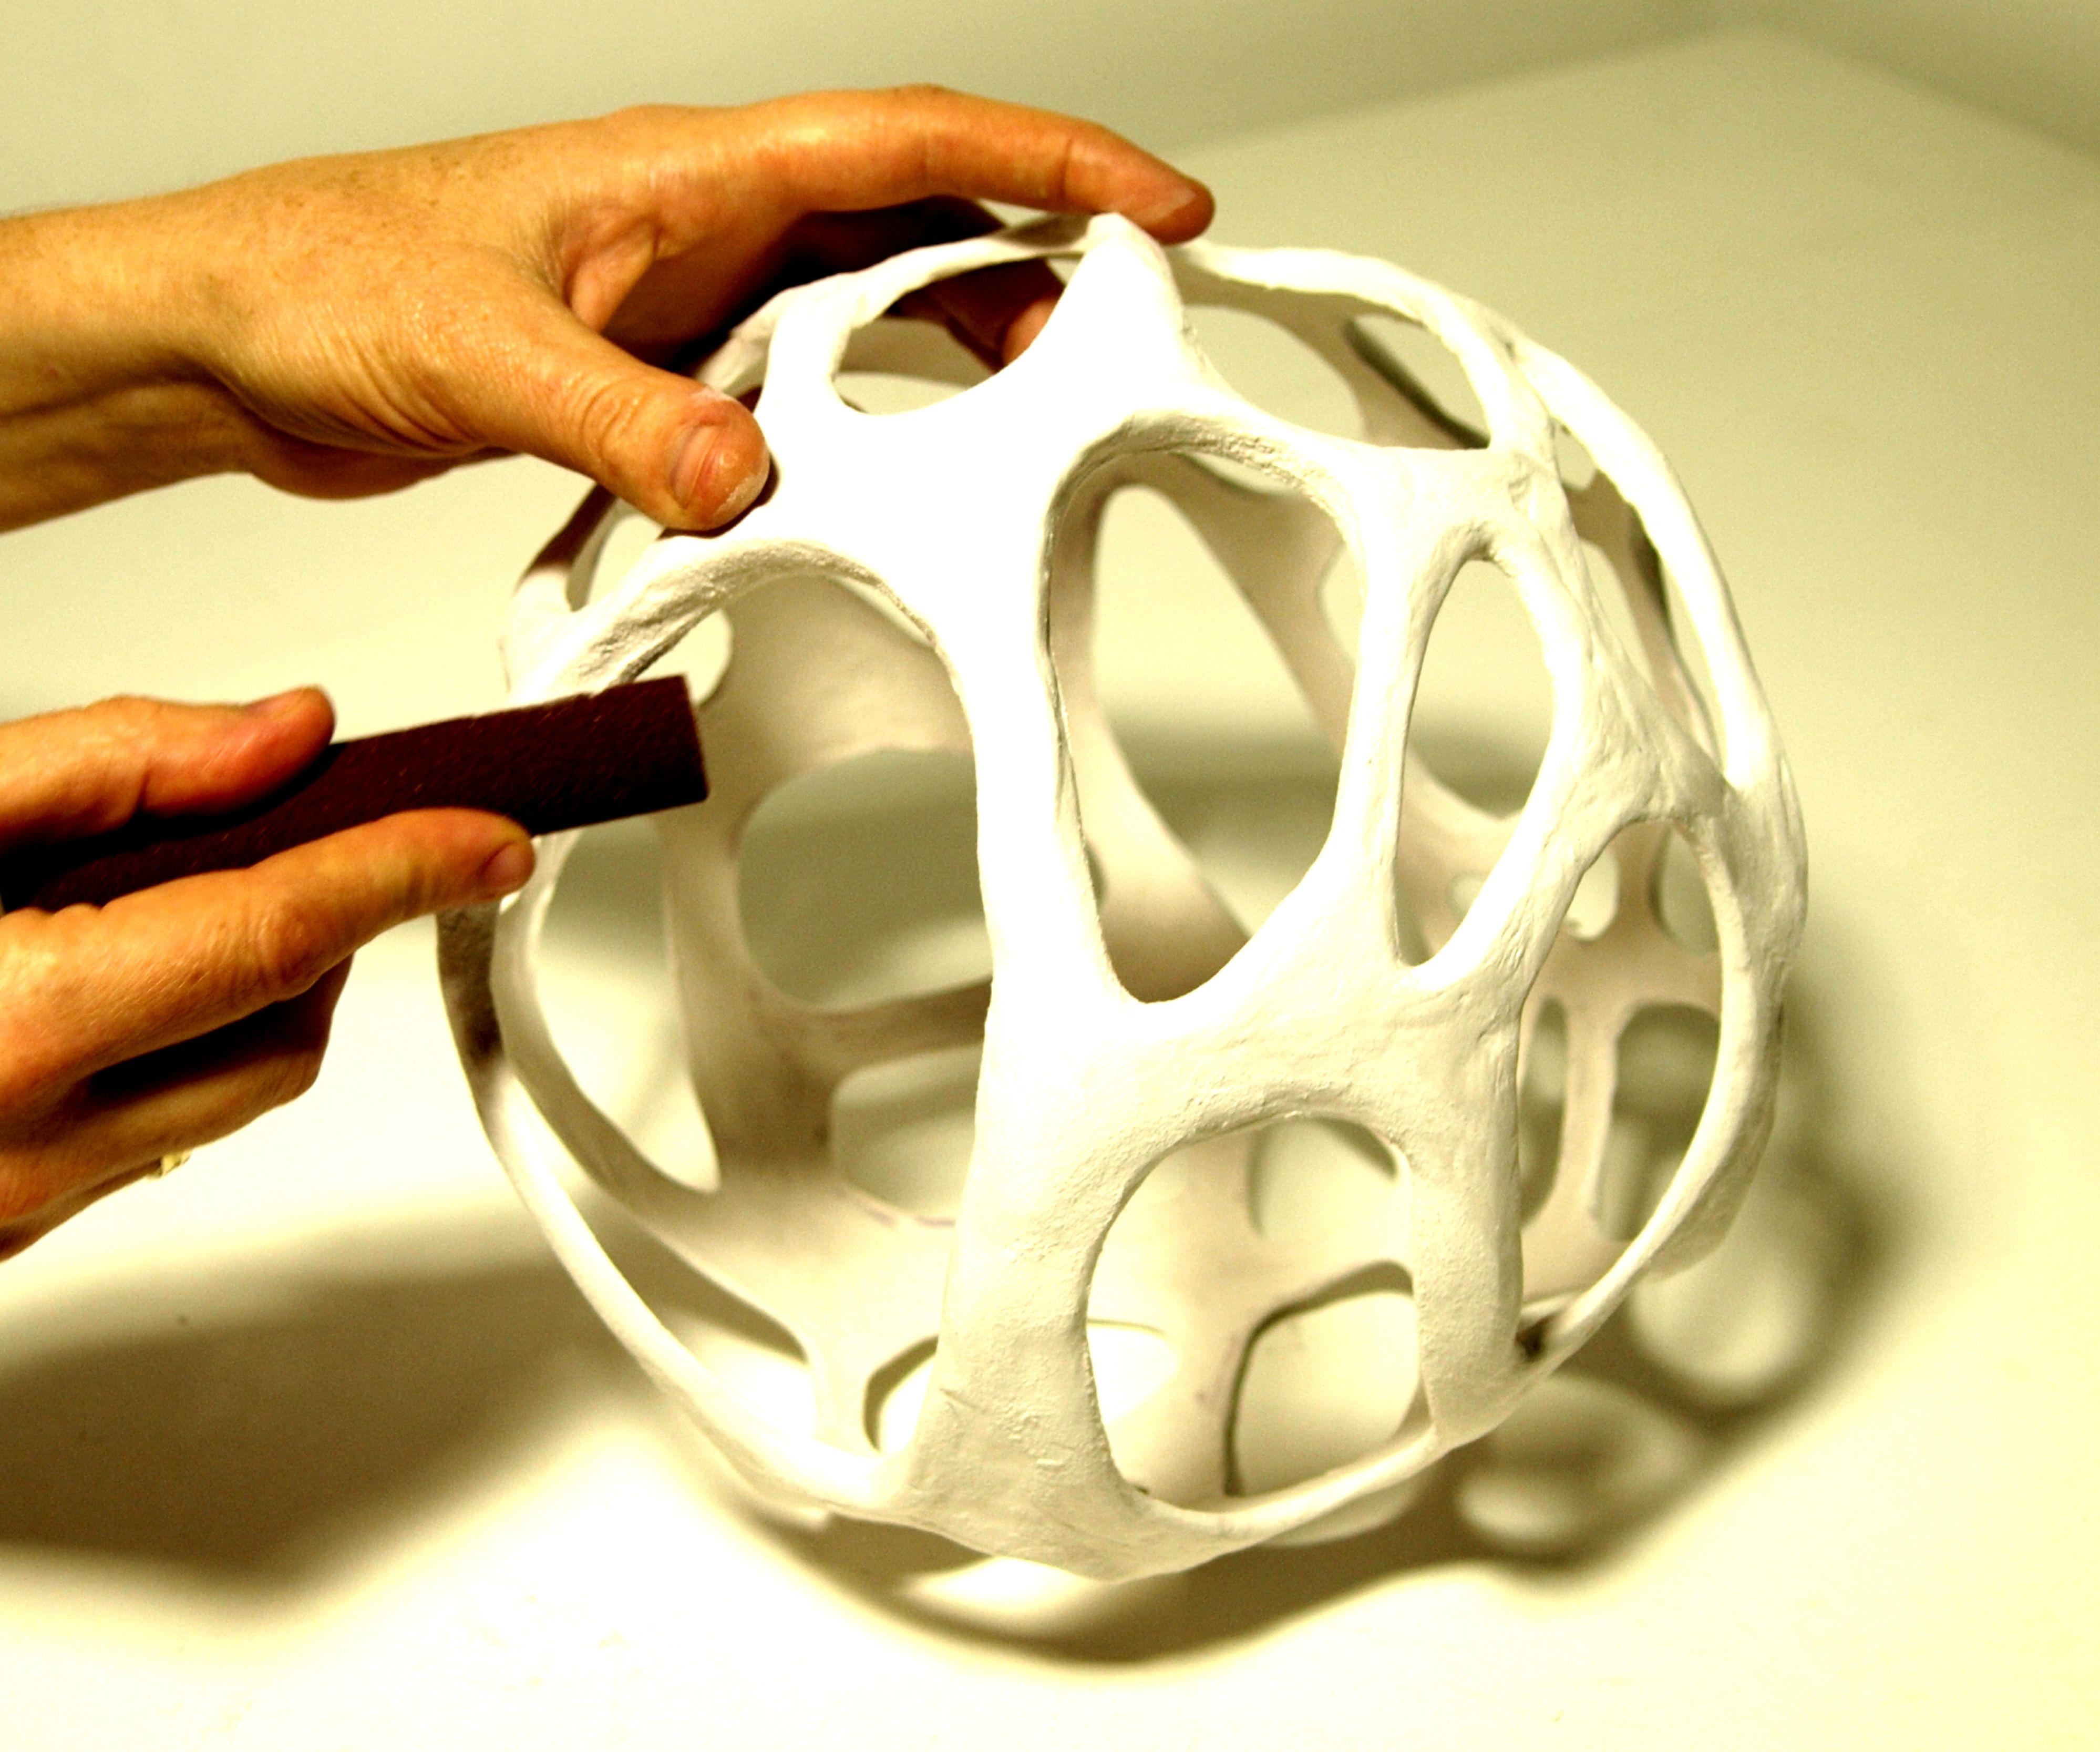 DIY Cellular Organic Lampshade Without a 3D Printer